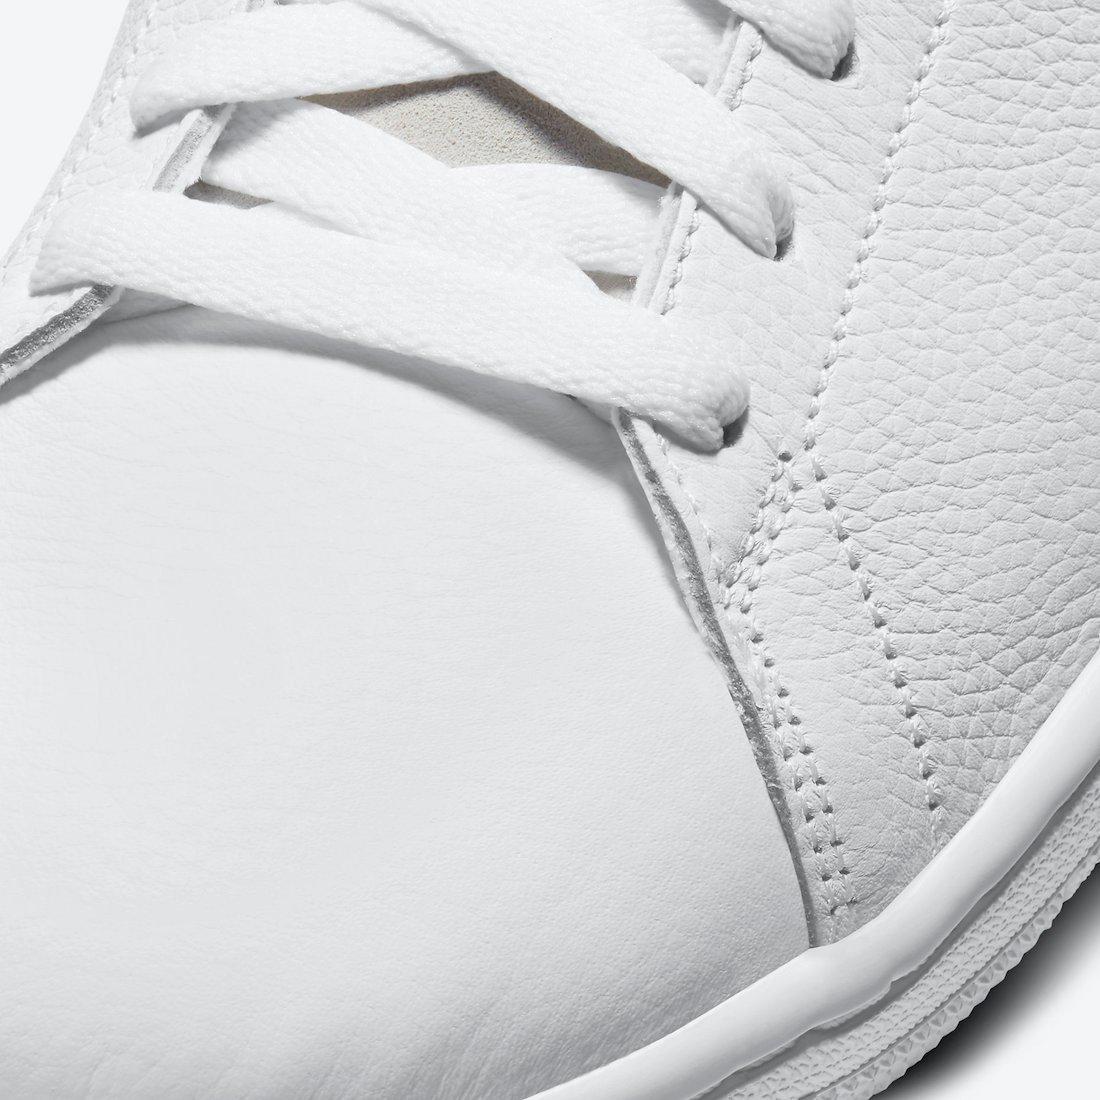 Jordan Centre Court White DJ2756-100 Release Date